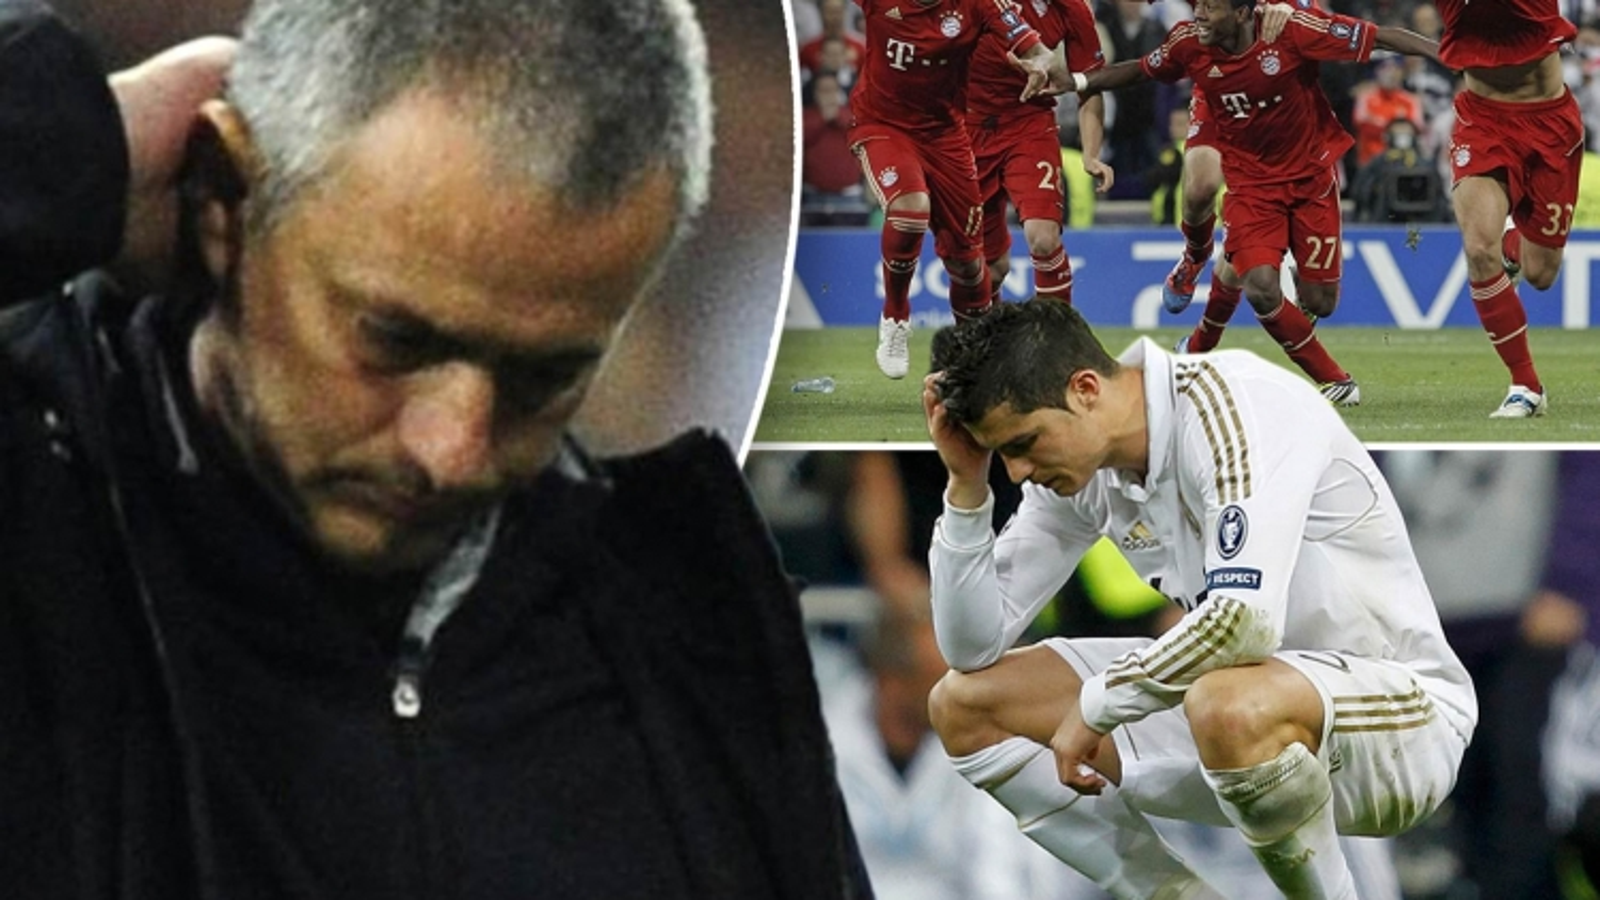 Trận thua duy nhất khiến Jose Mourinho phải bật khóc